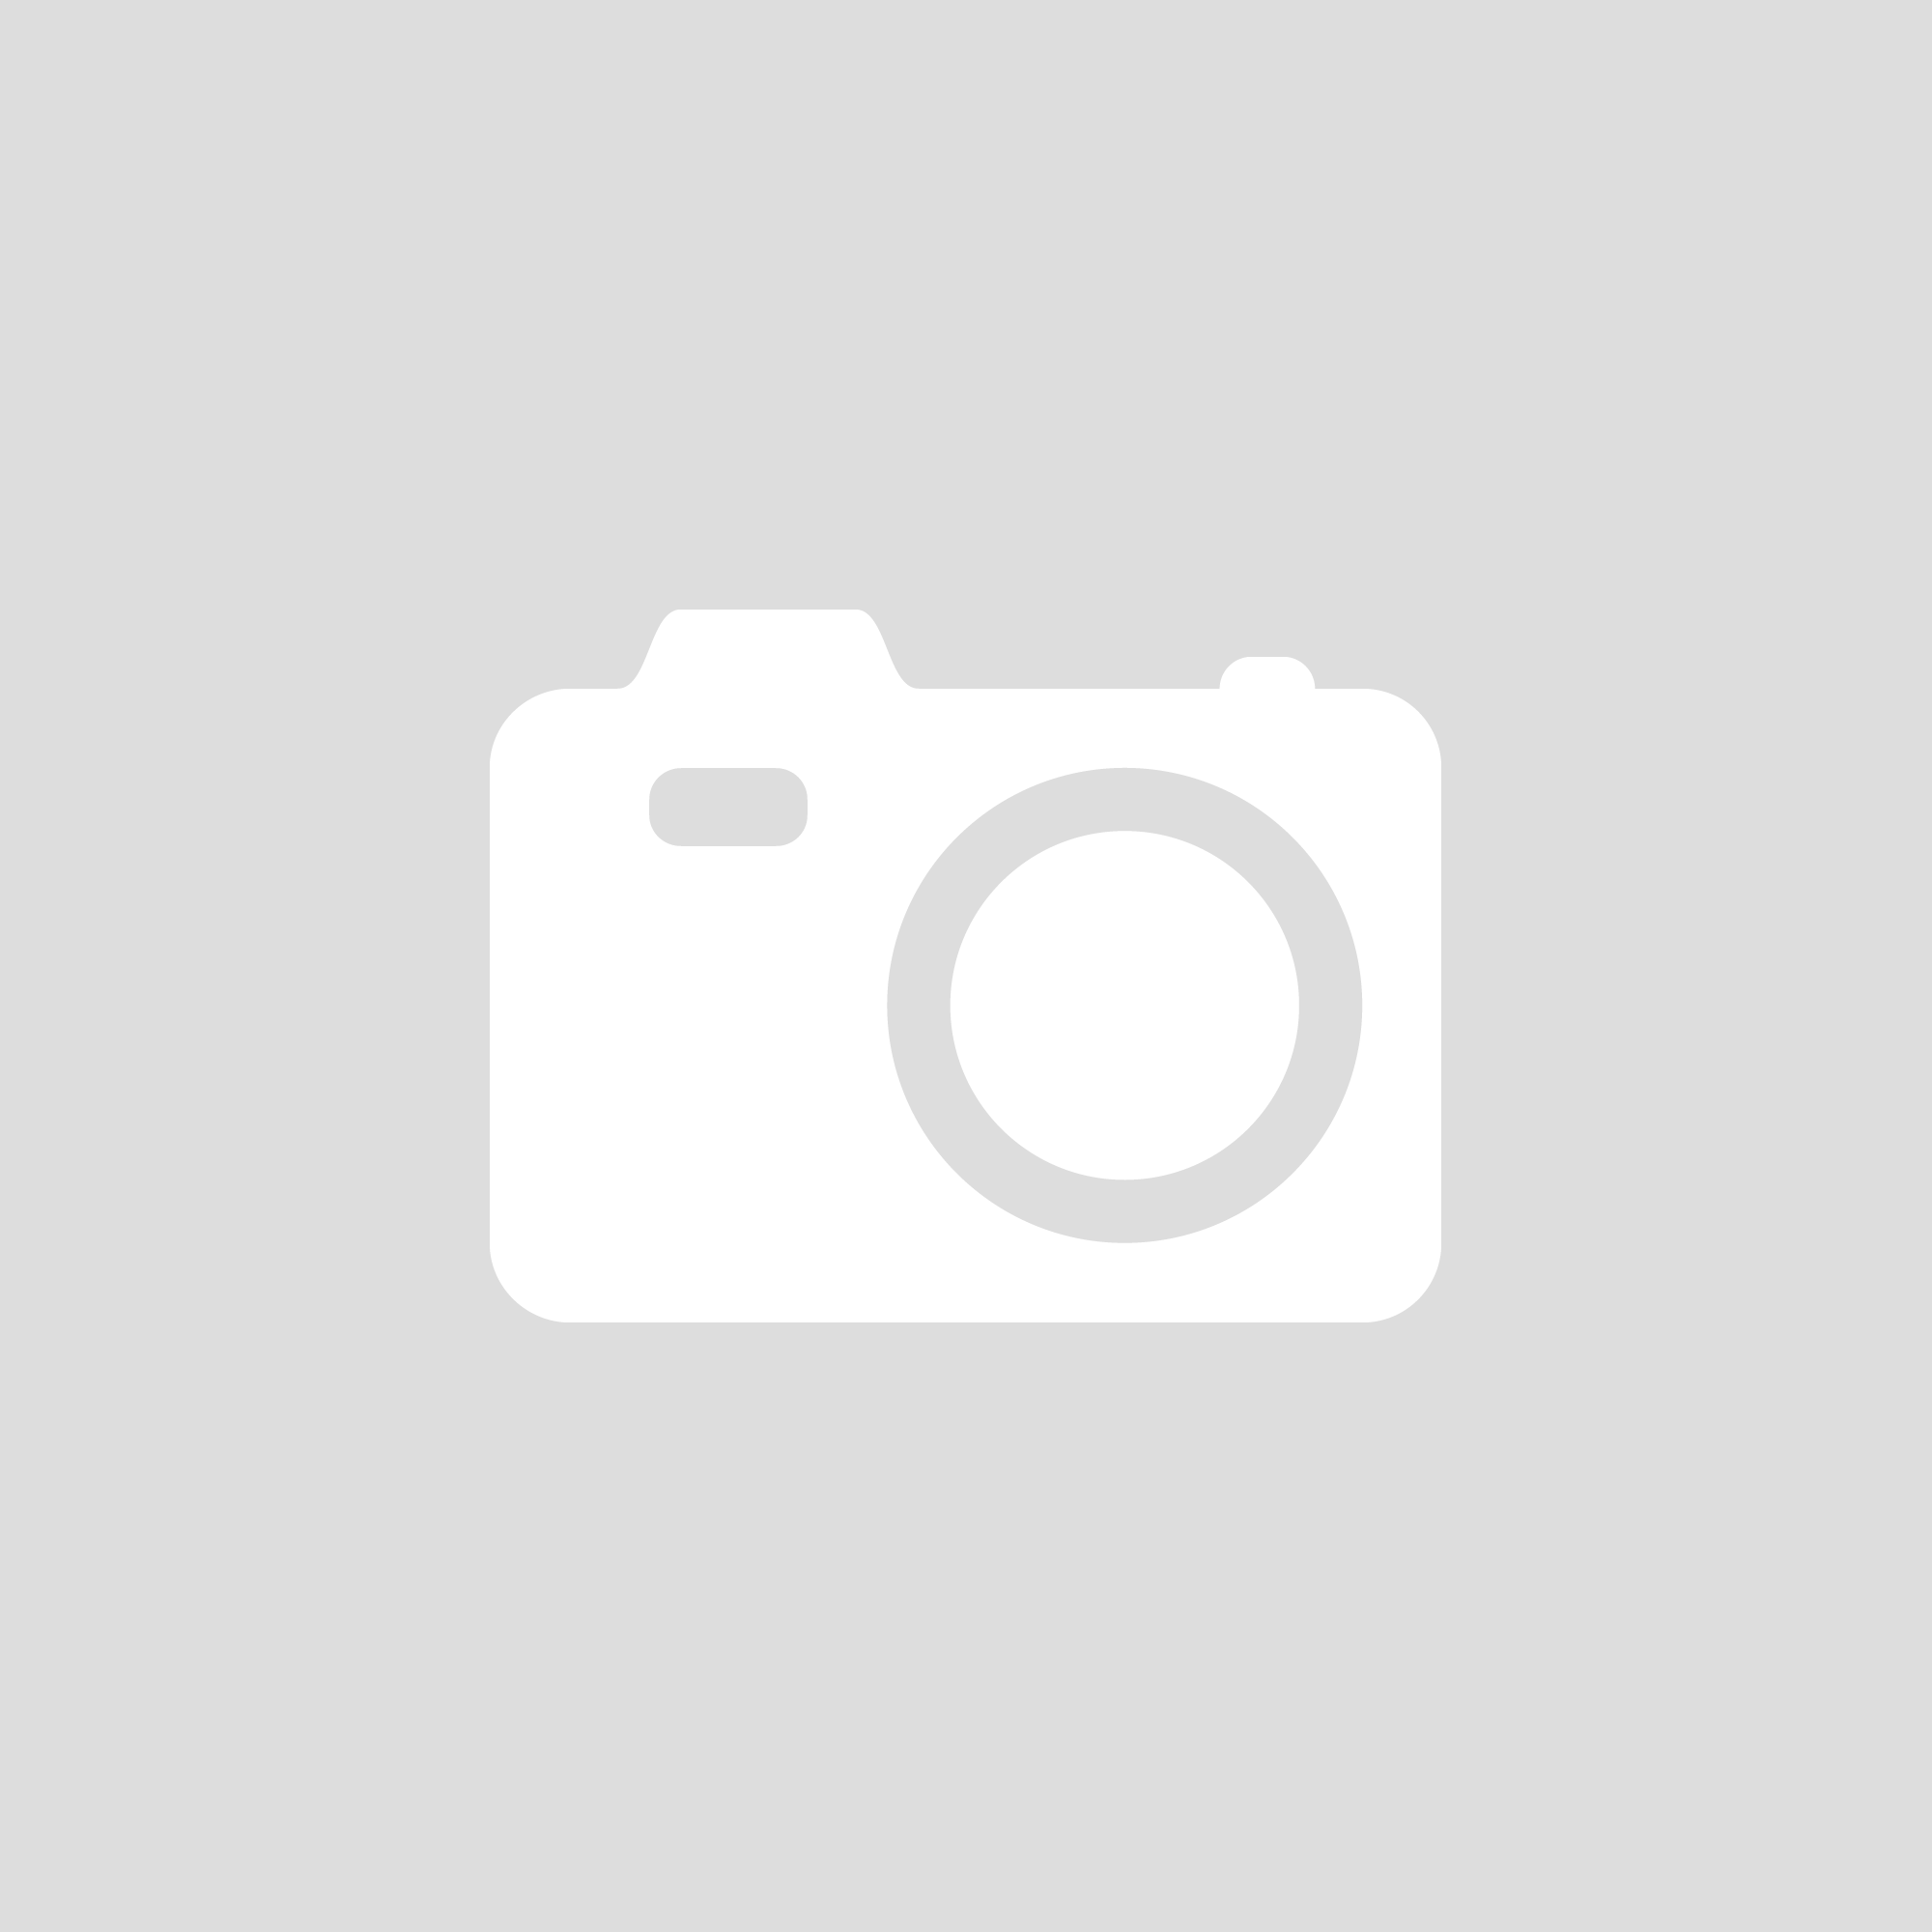 Regency Plain Texture Cream Wallpaper by Ideco Home for GranDeco BOB-14-01-4